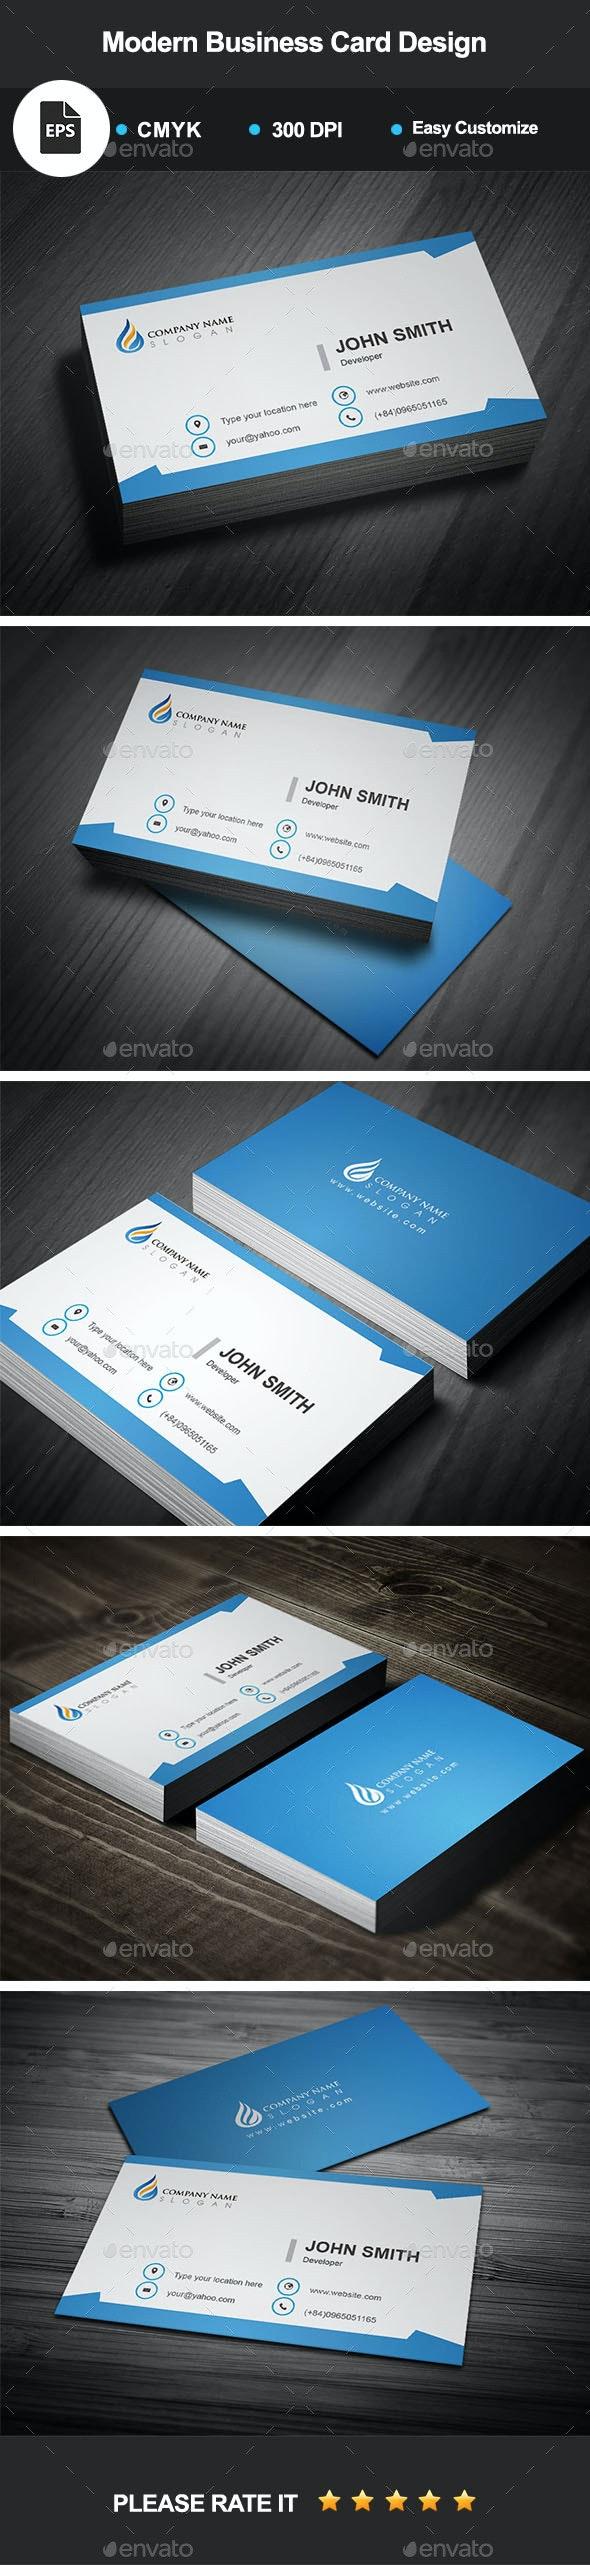 Modern Business Card Design - Creative Business Cards